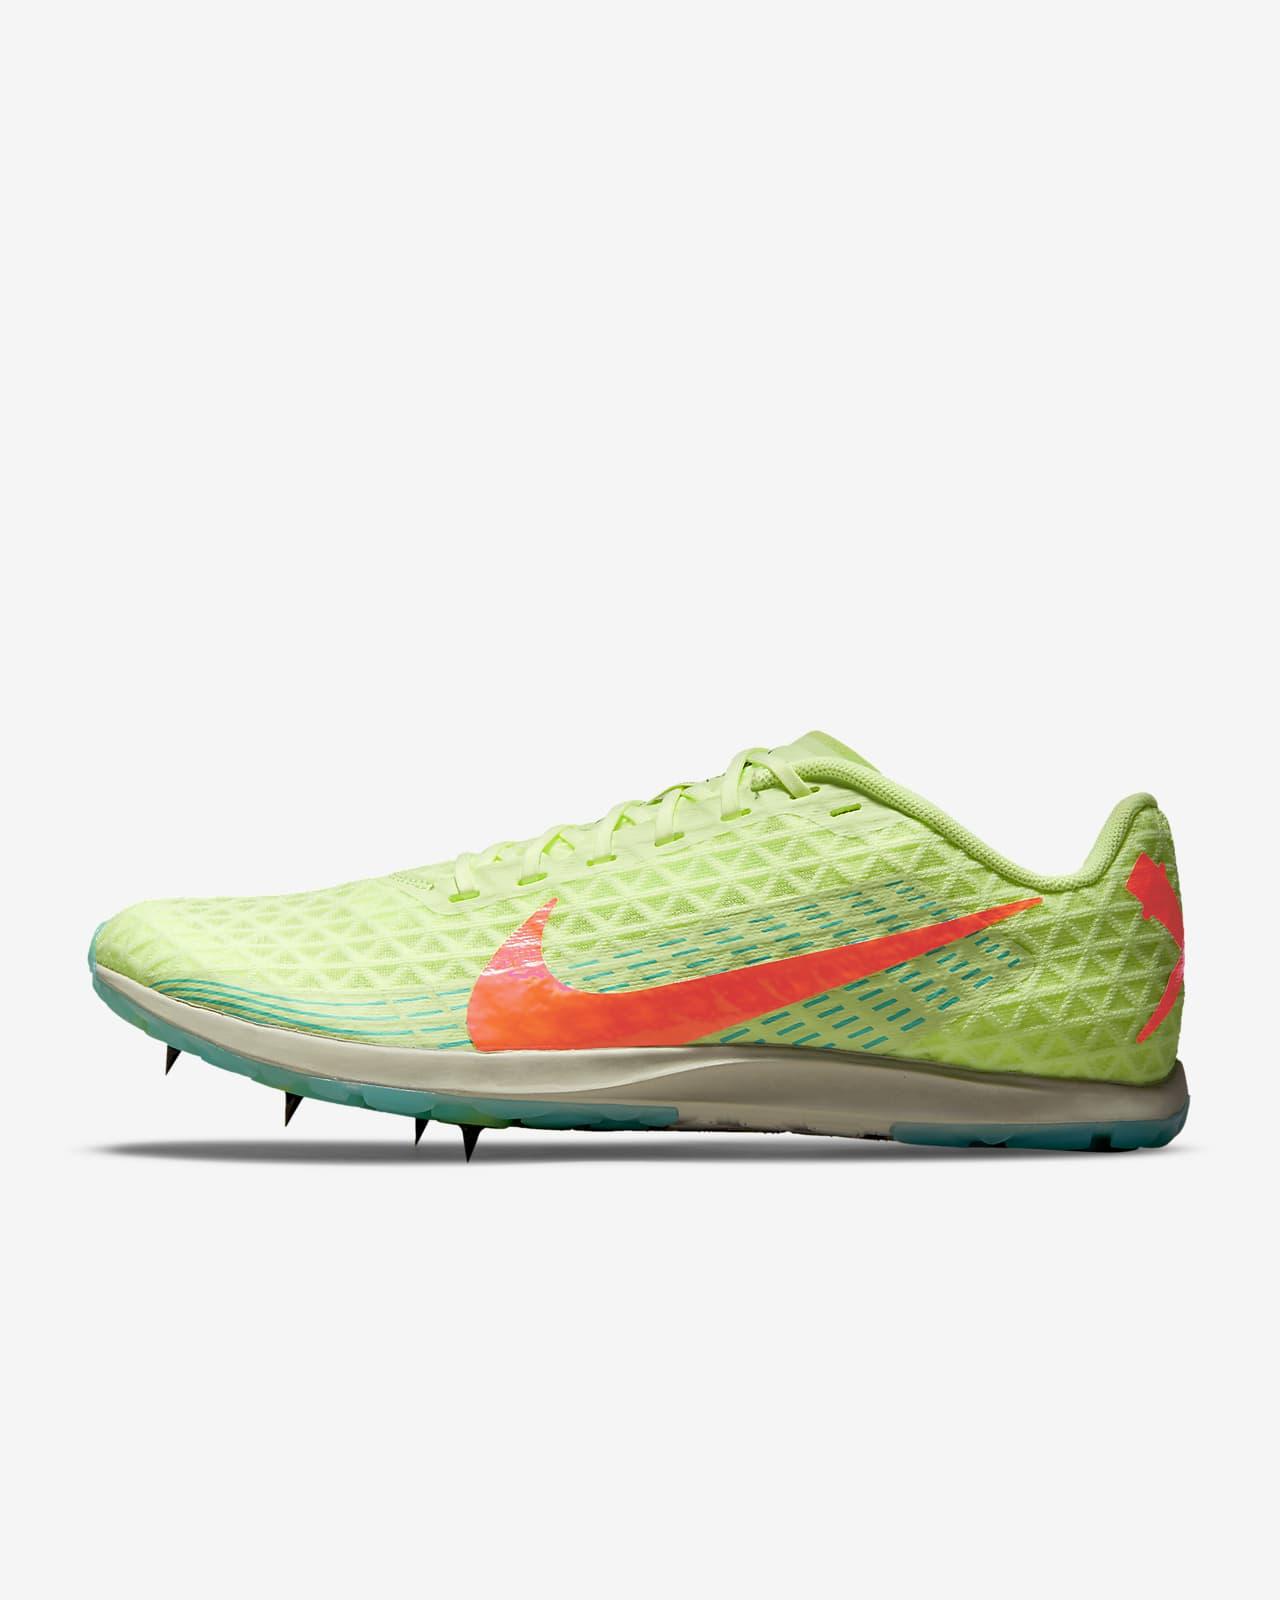 Chaussure de running de fond à pointes Nike Zoom RivalXC 5